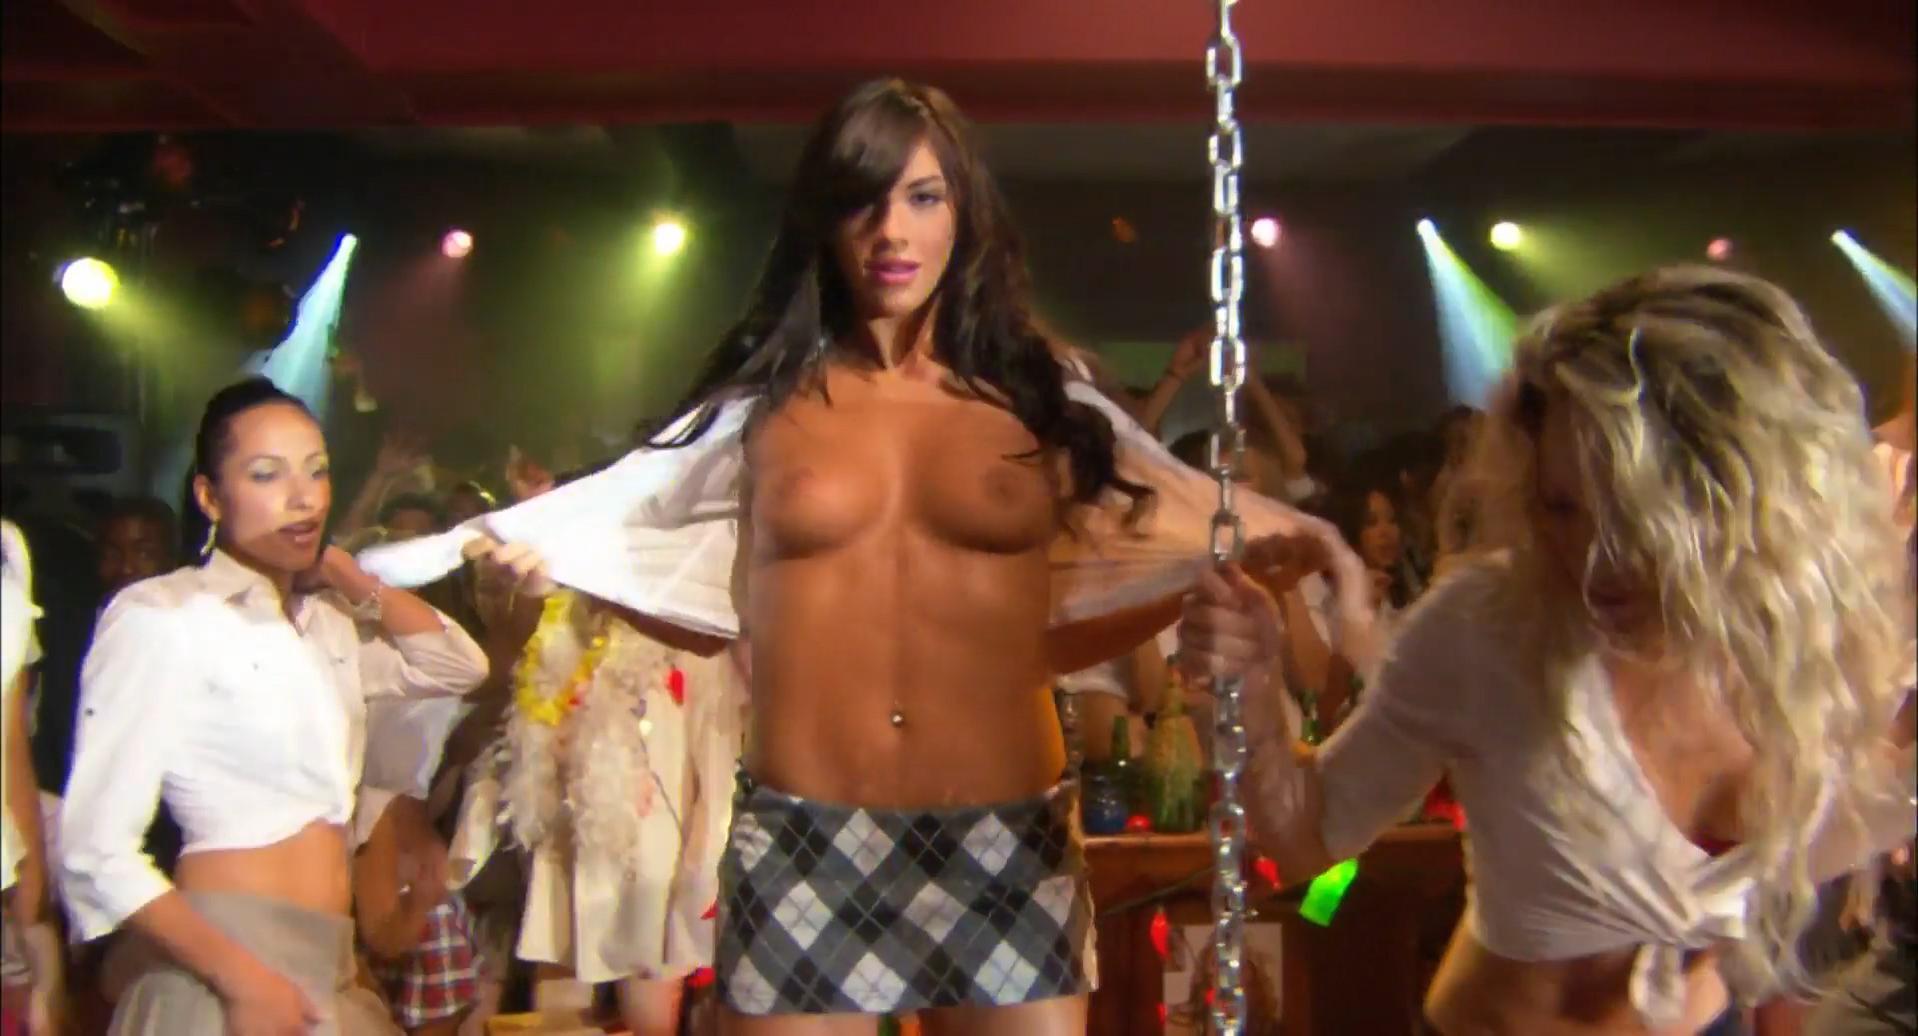 American Pie Presents Beta House Sex Scene nude video celebs » angela besharah nude, michelle suppa